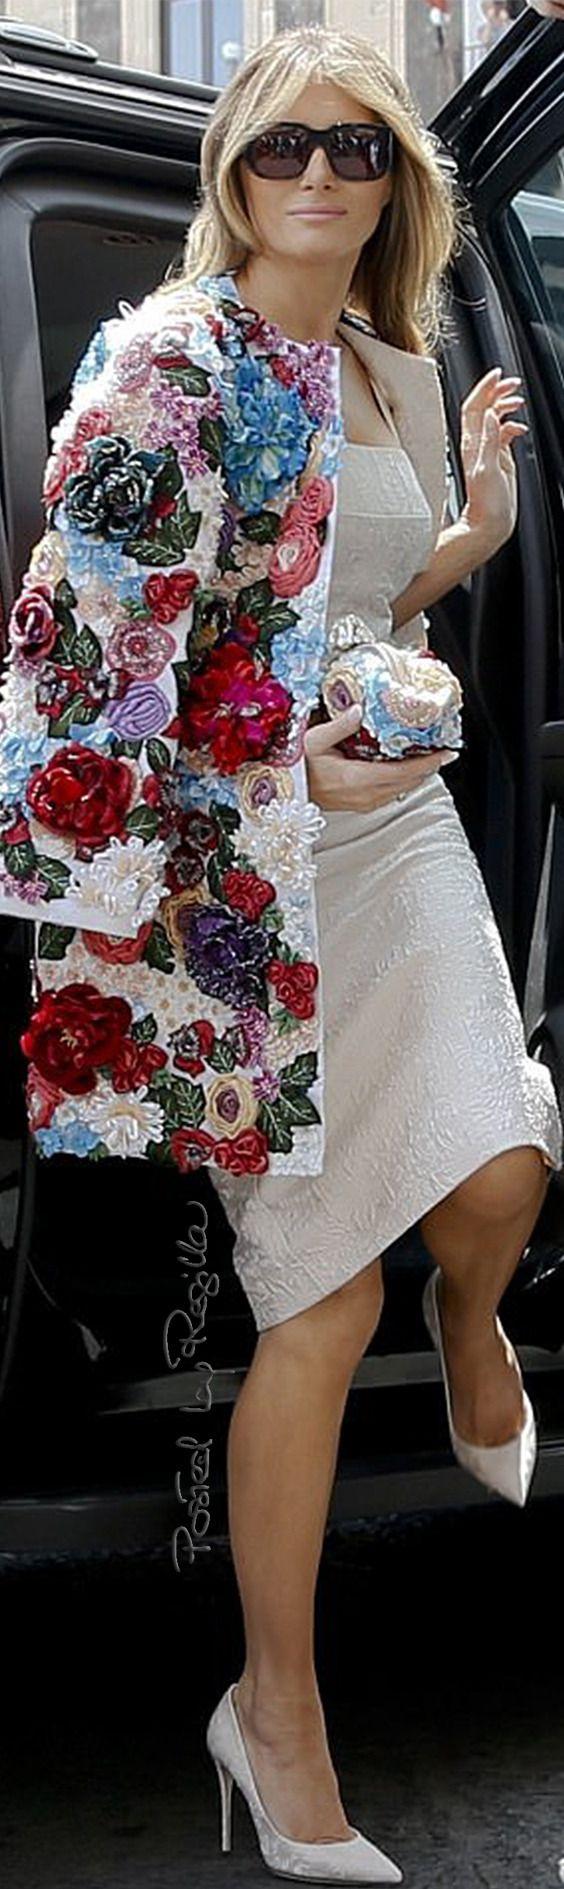 Regilla ⚜ Melania Trump in Dolce & Gabbana, Taormina, Italy. May 2017